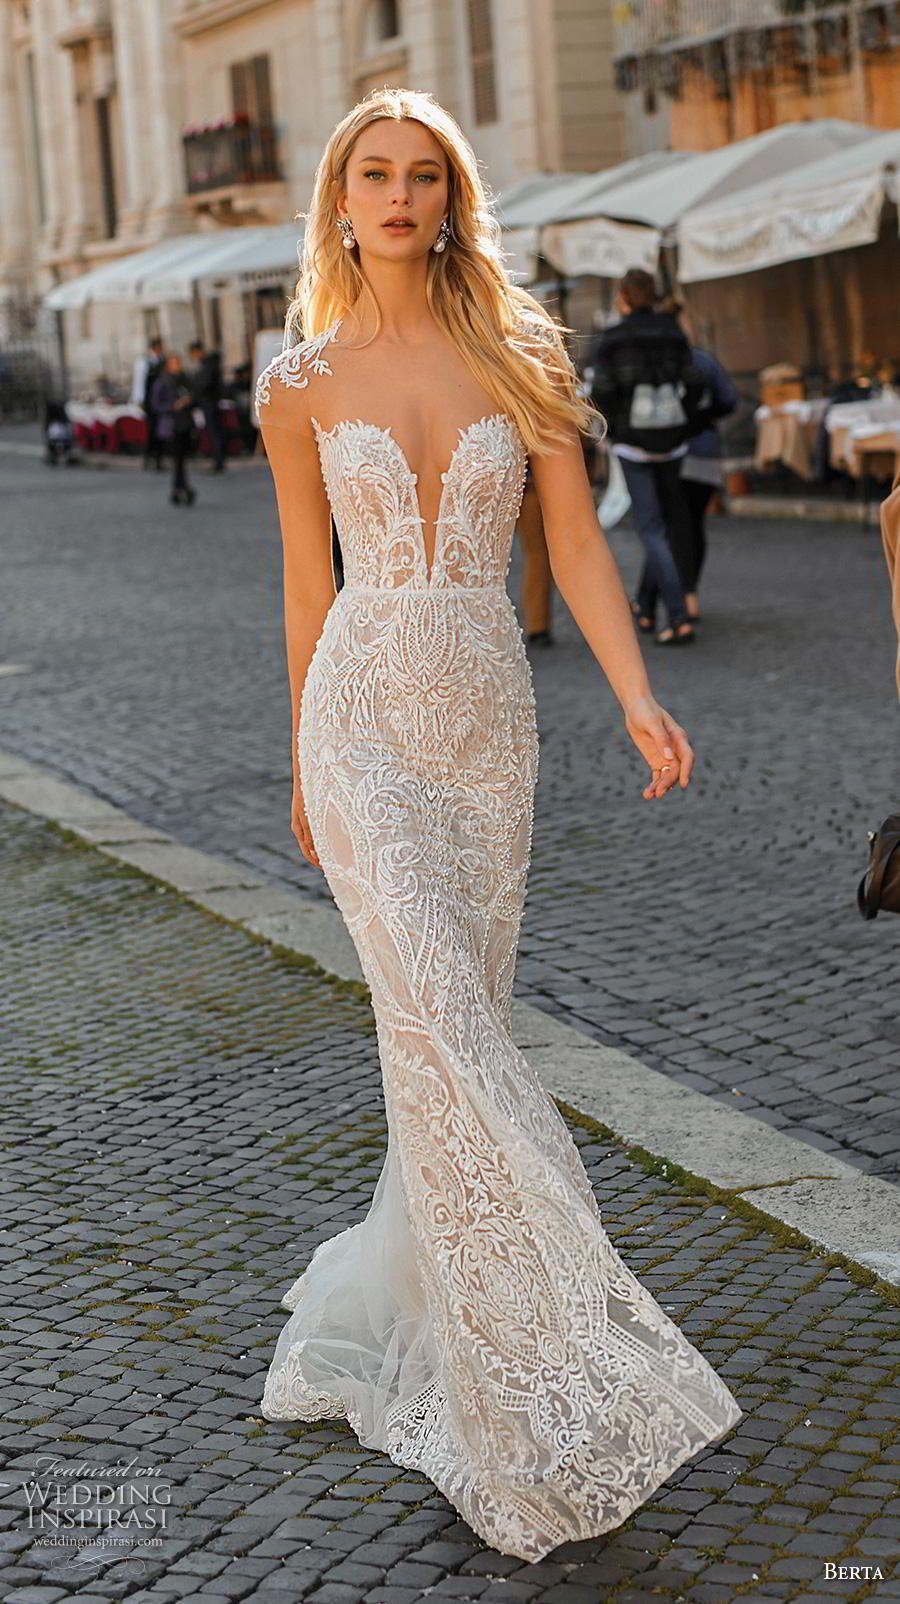 403530fc40c2 berta 2020 privee bridal cap sleeves illusion bateau deep plunging  sweetheart neckline full embellishment elegant fit